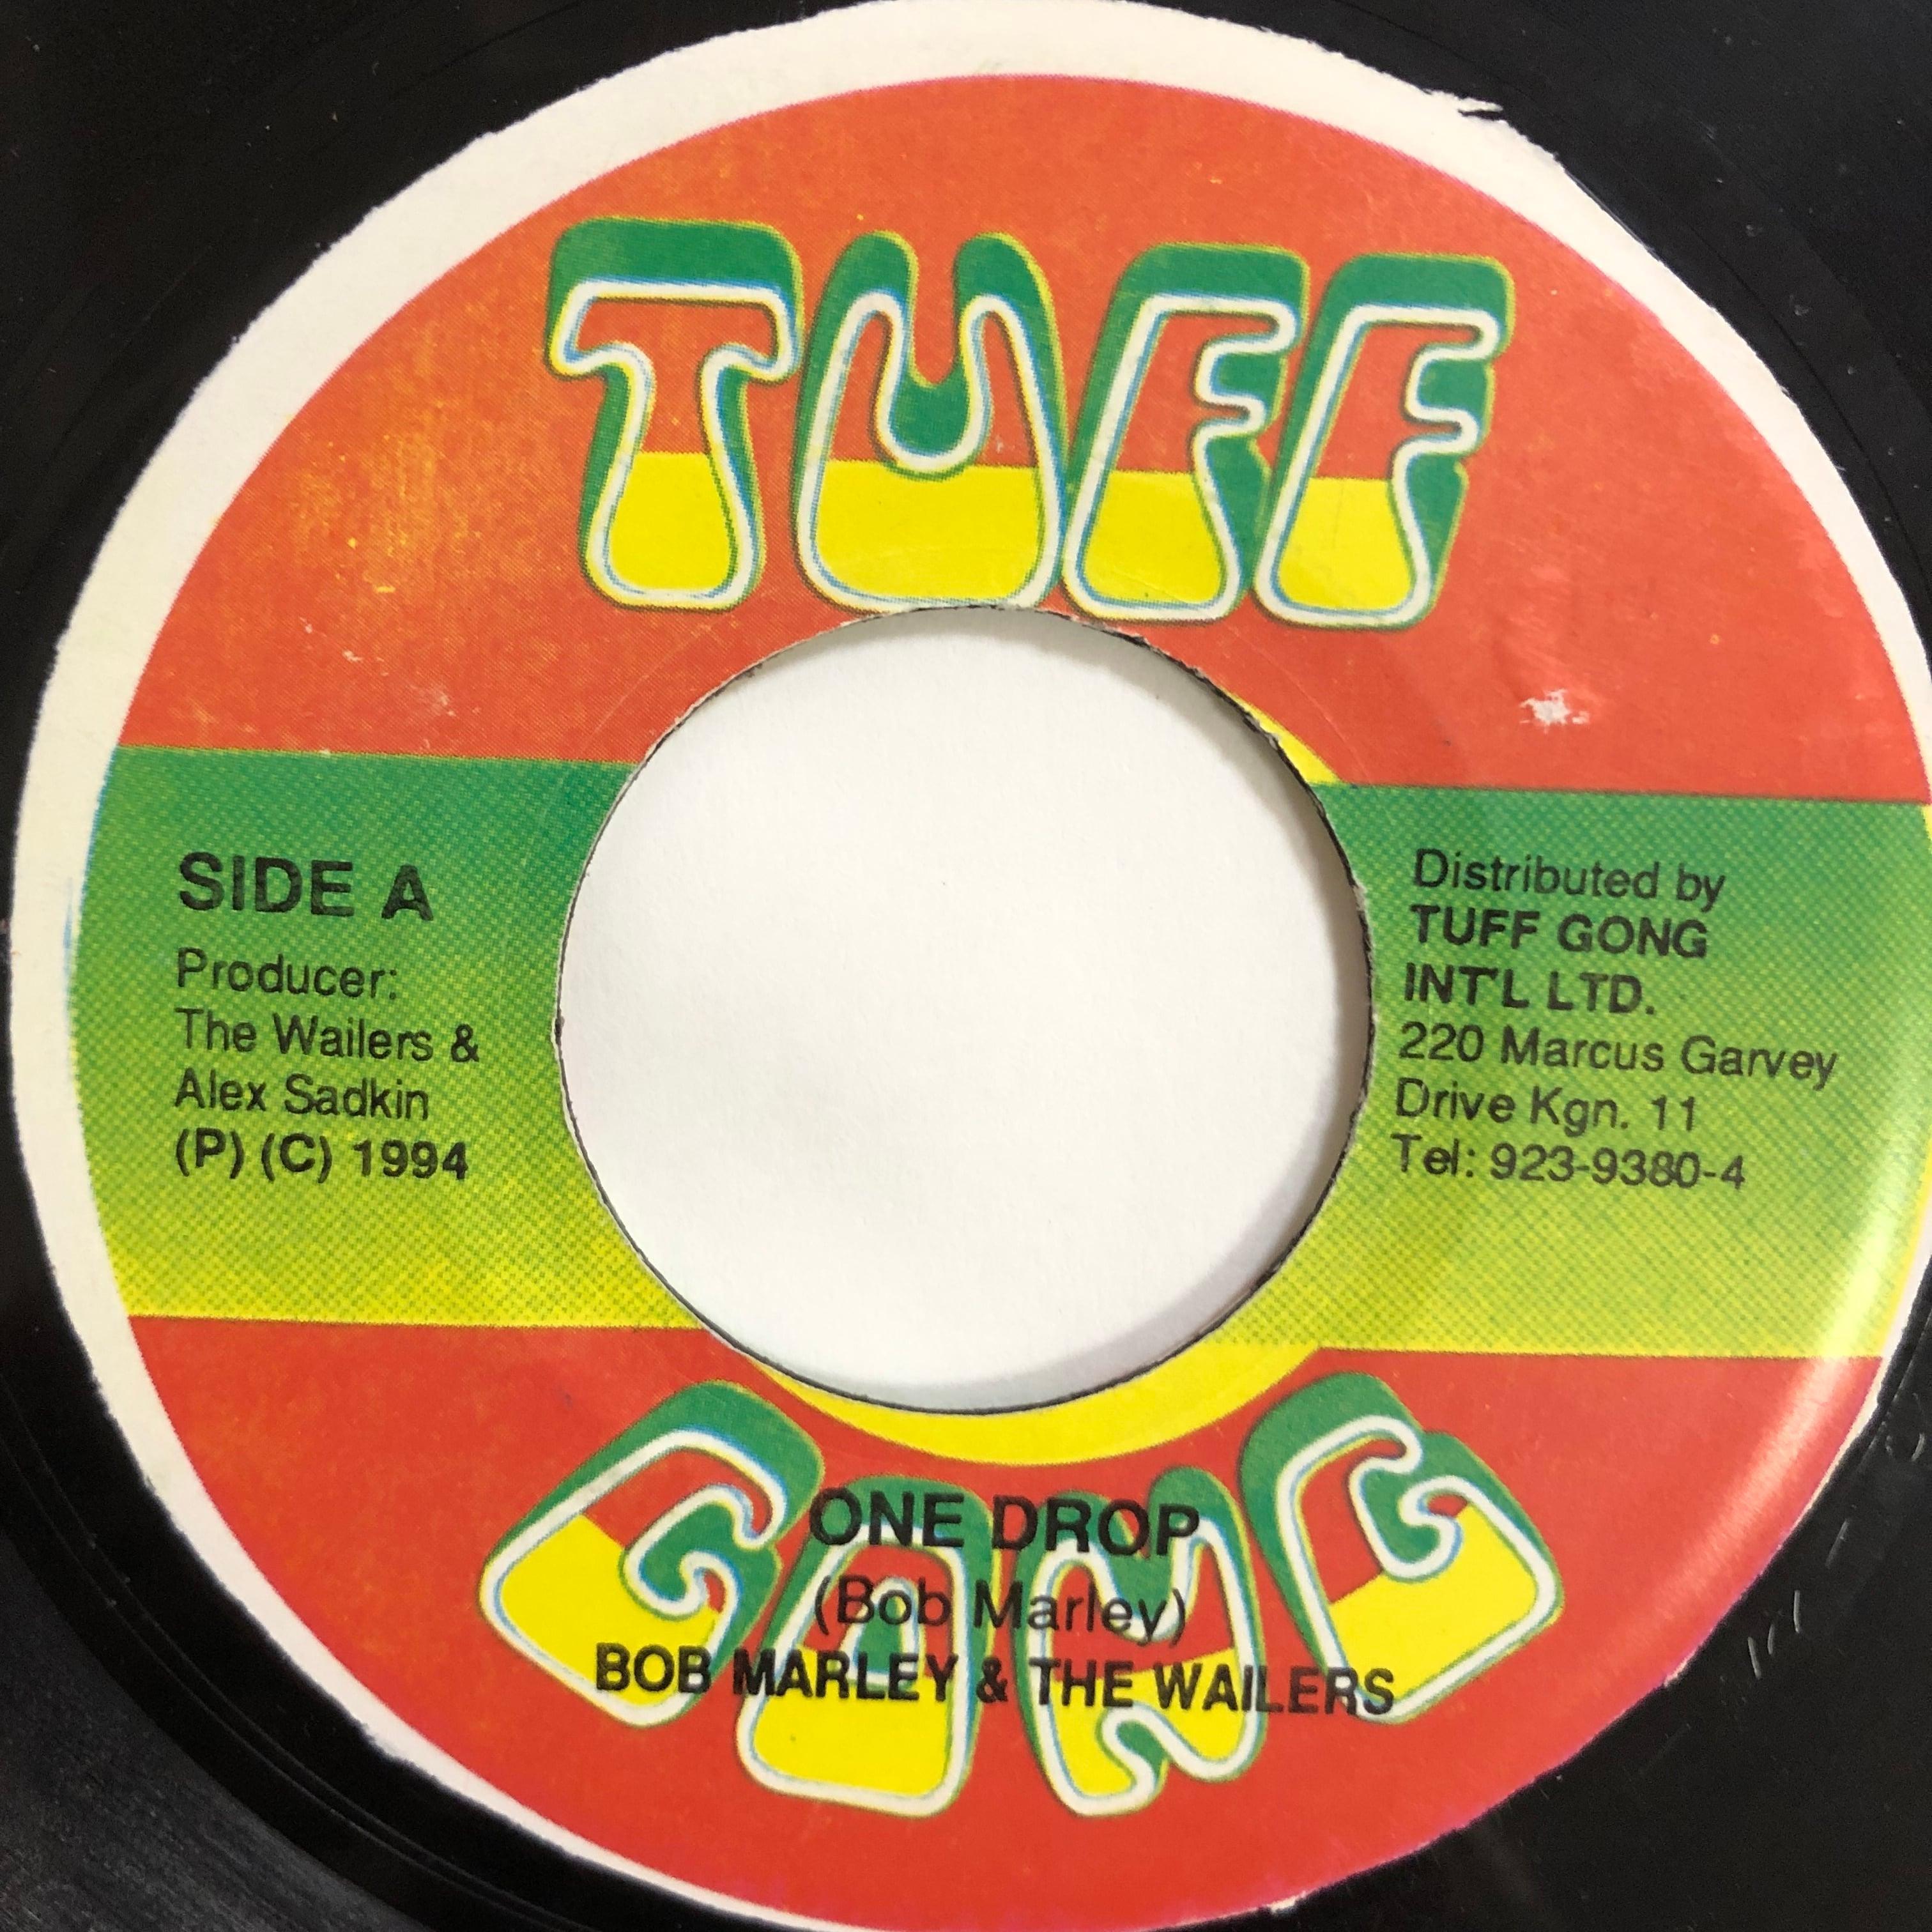 Bob Marley (ボブ・マーリー) & The Wailers (ウェイラーズ) - One Drop【7-20206】